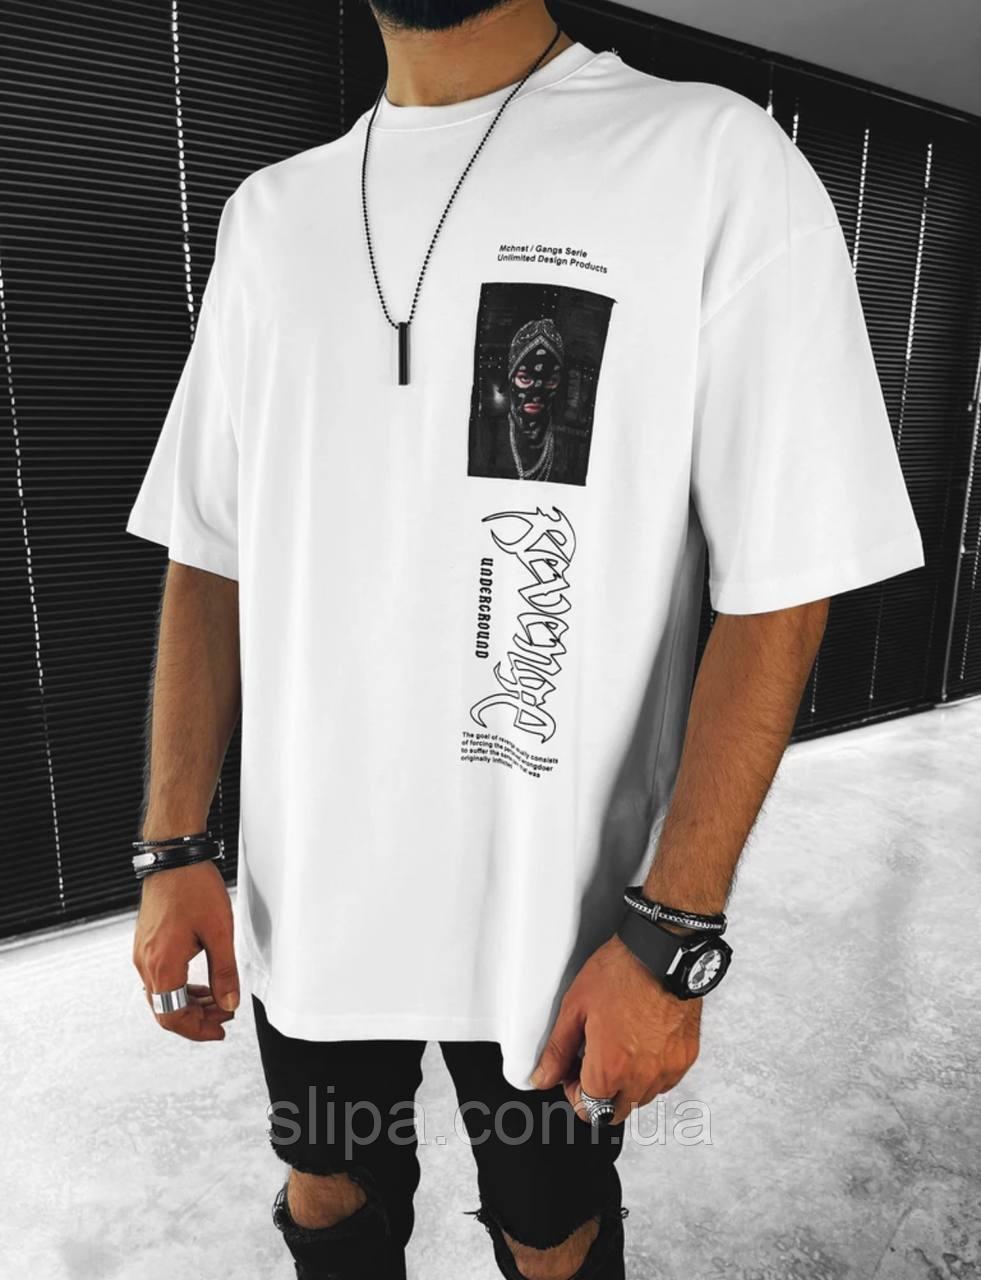 Біла мжская оверсайз футболка з принтом UNDERGROUND | Туреччина | 100% бавовна